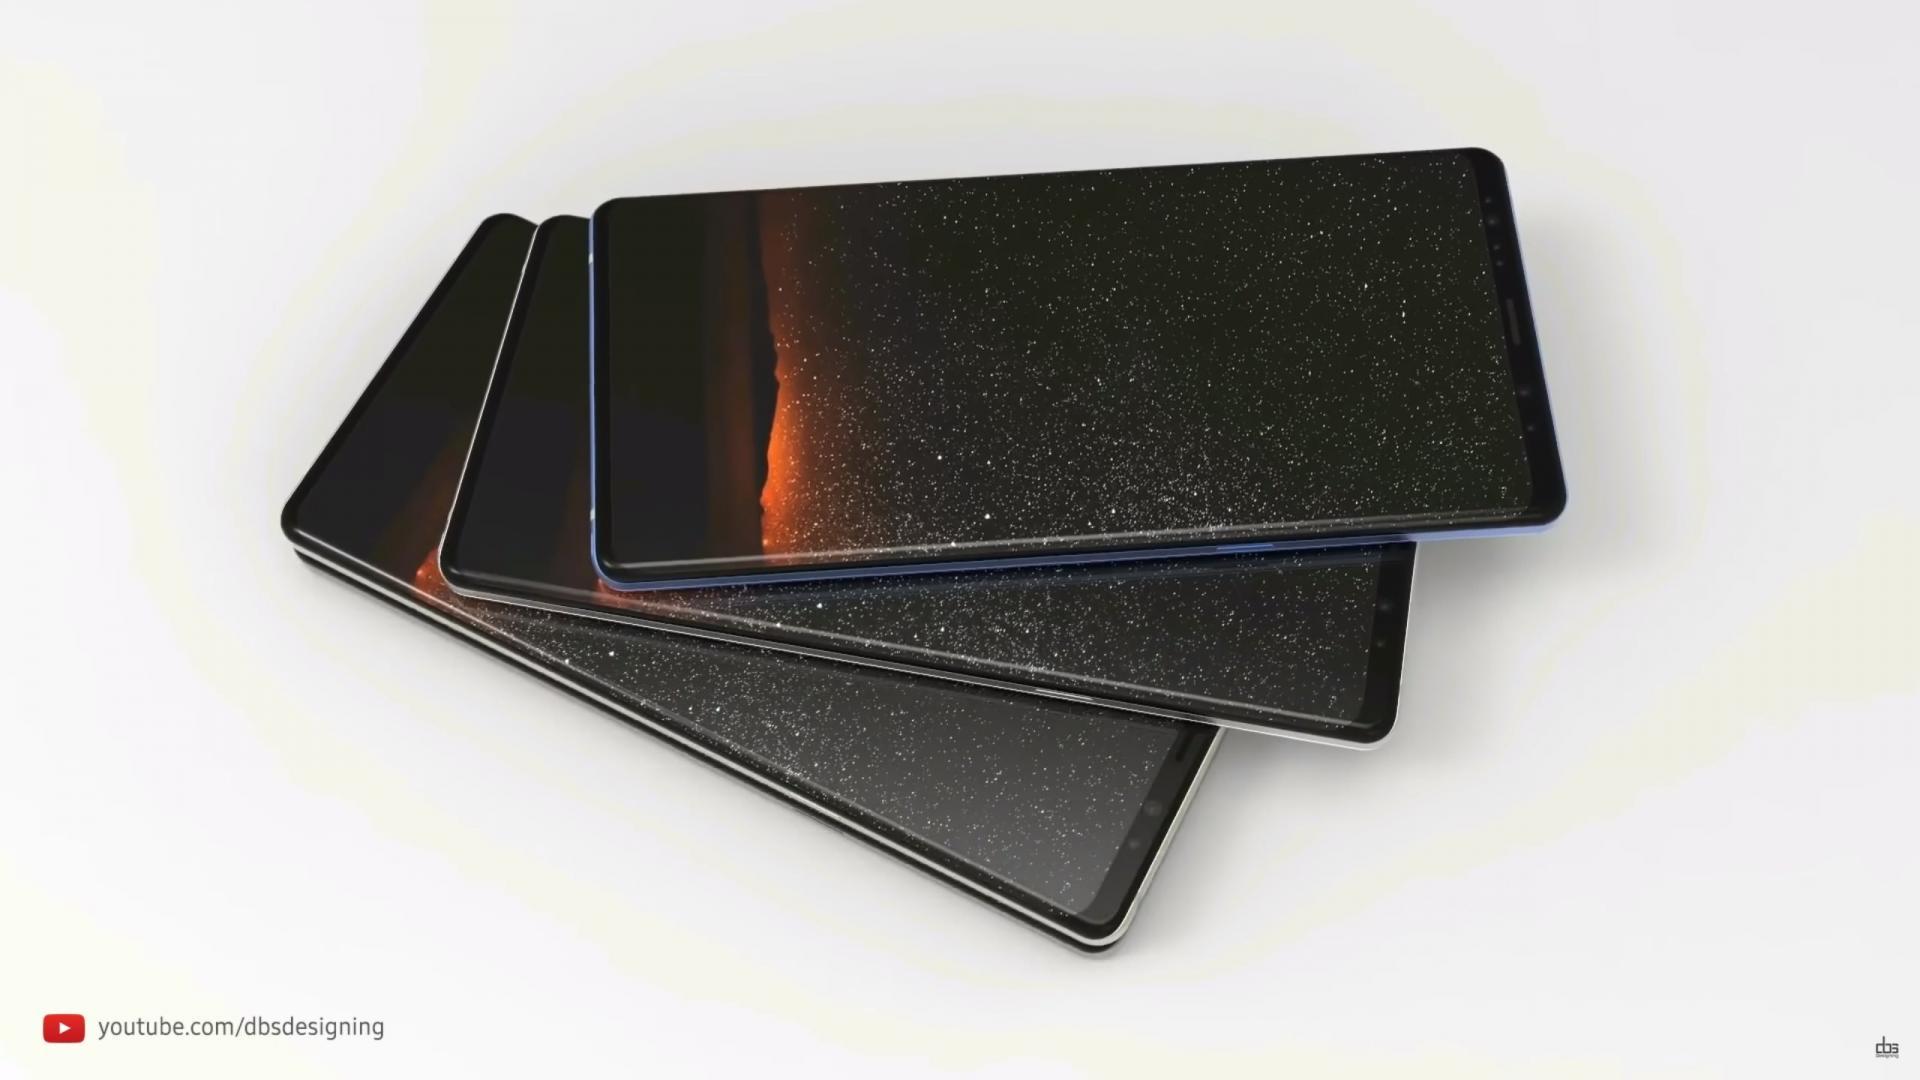 Galaxy Note 9 может выйти спамятью 8+512 гигабайт